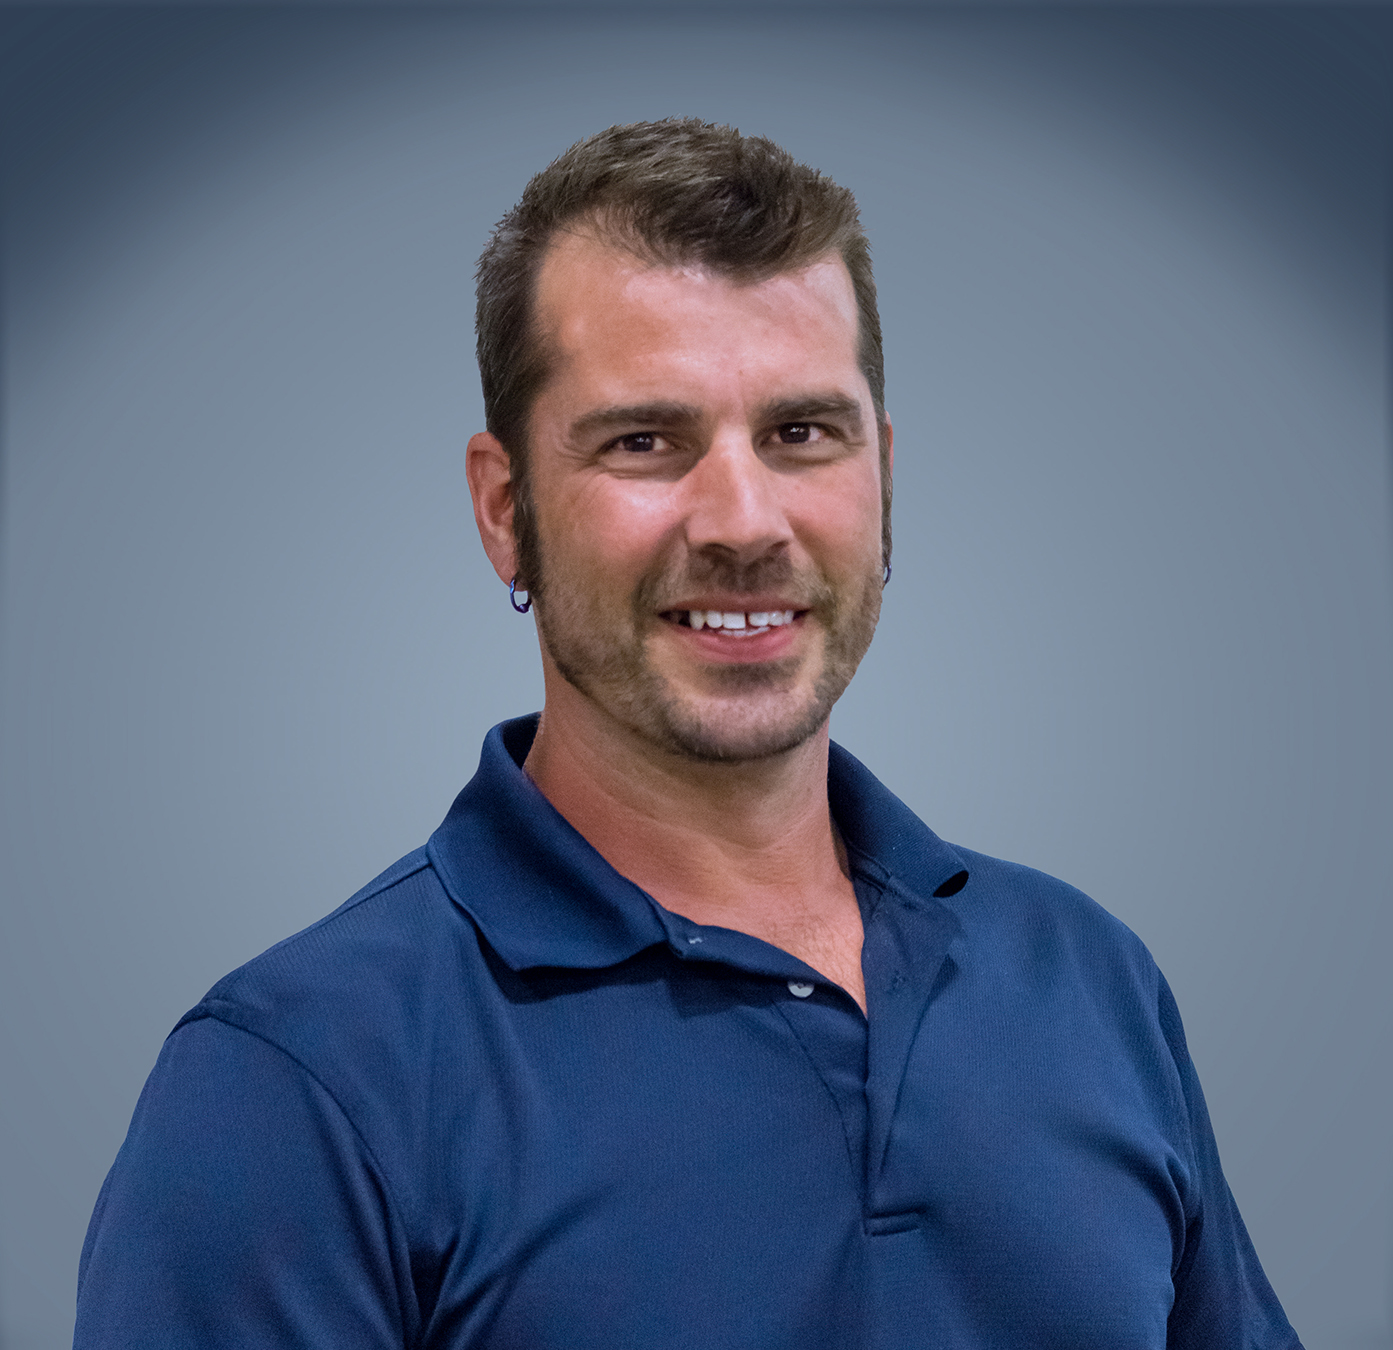 Kyle Peterson, Creatacor Project Manager